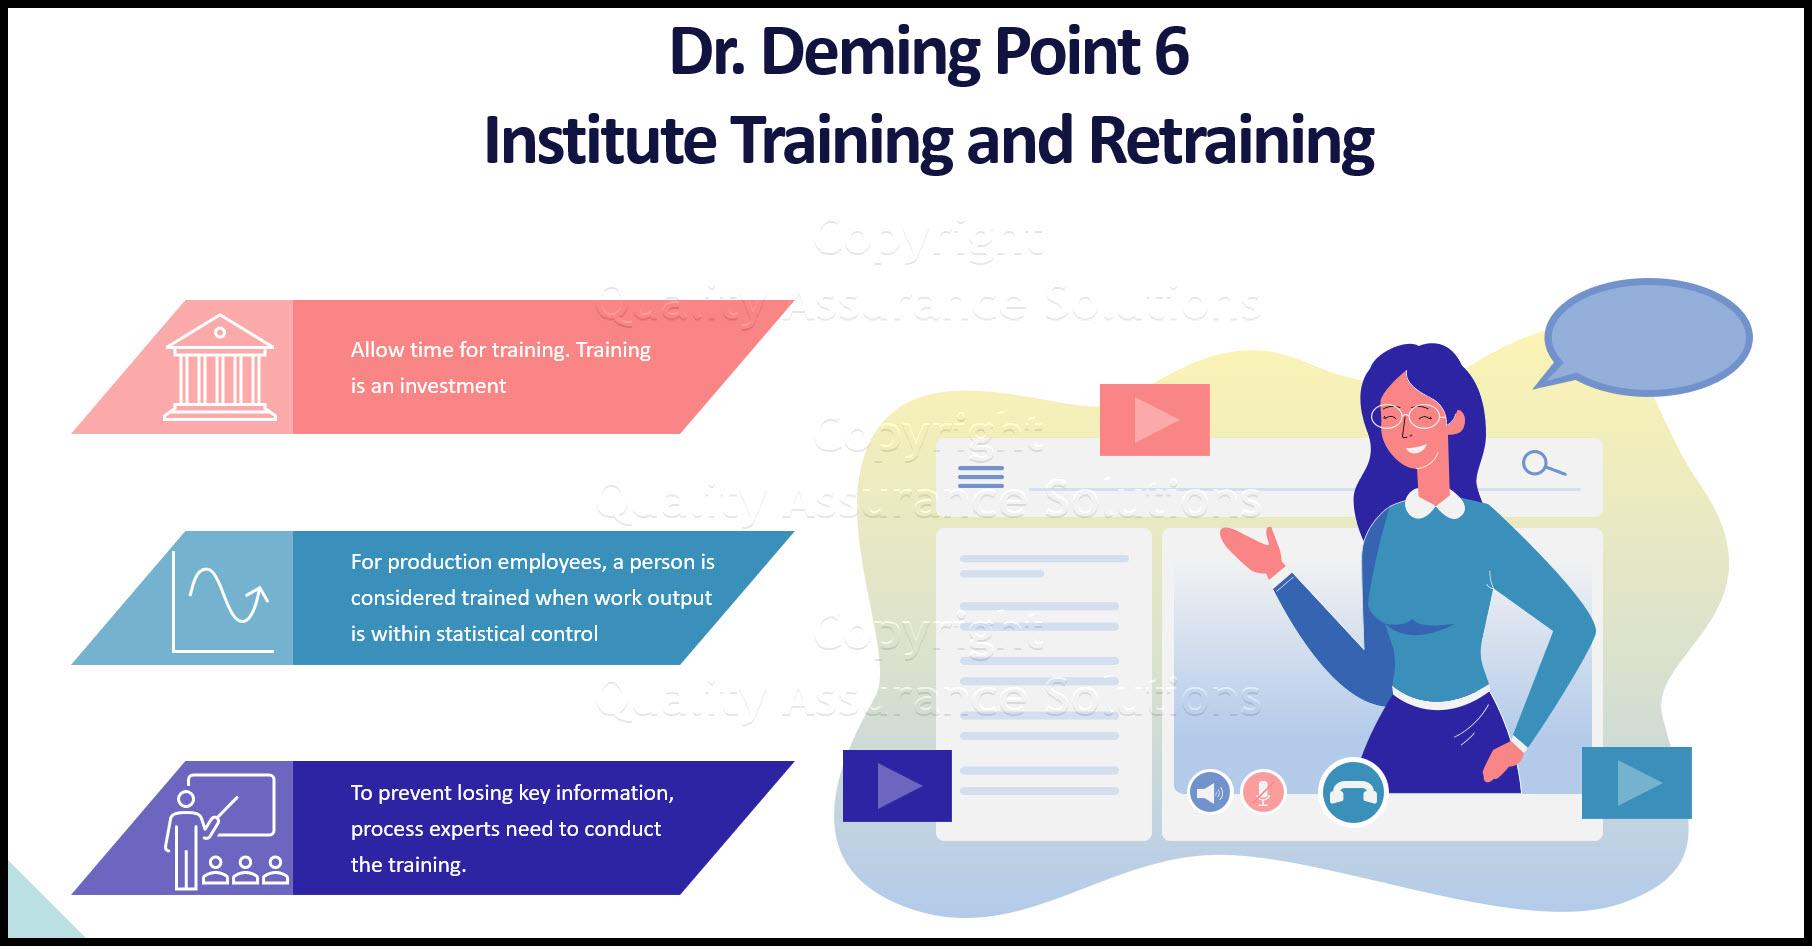 Deming Point 6 business slide